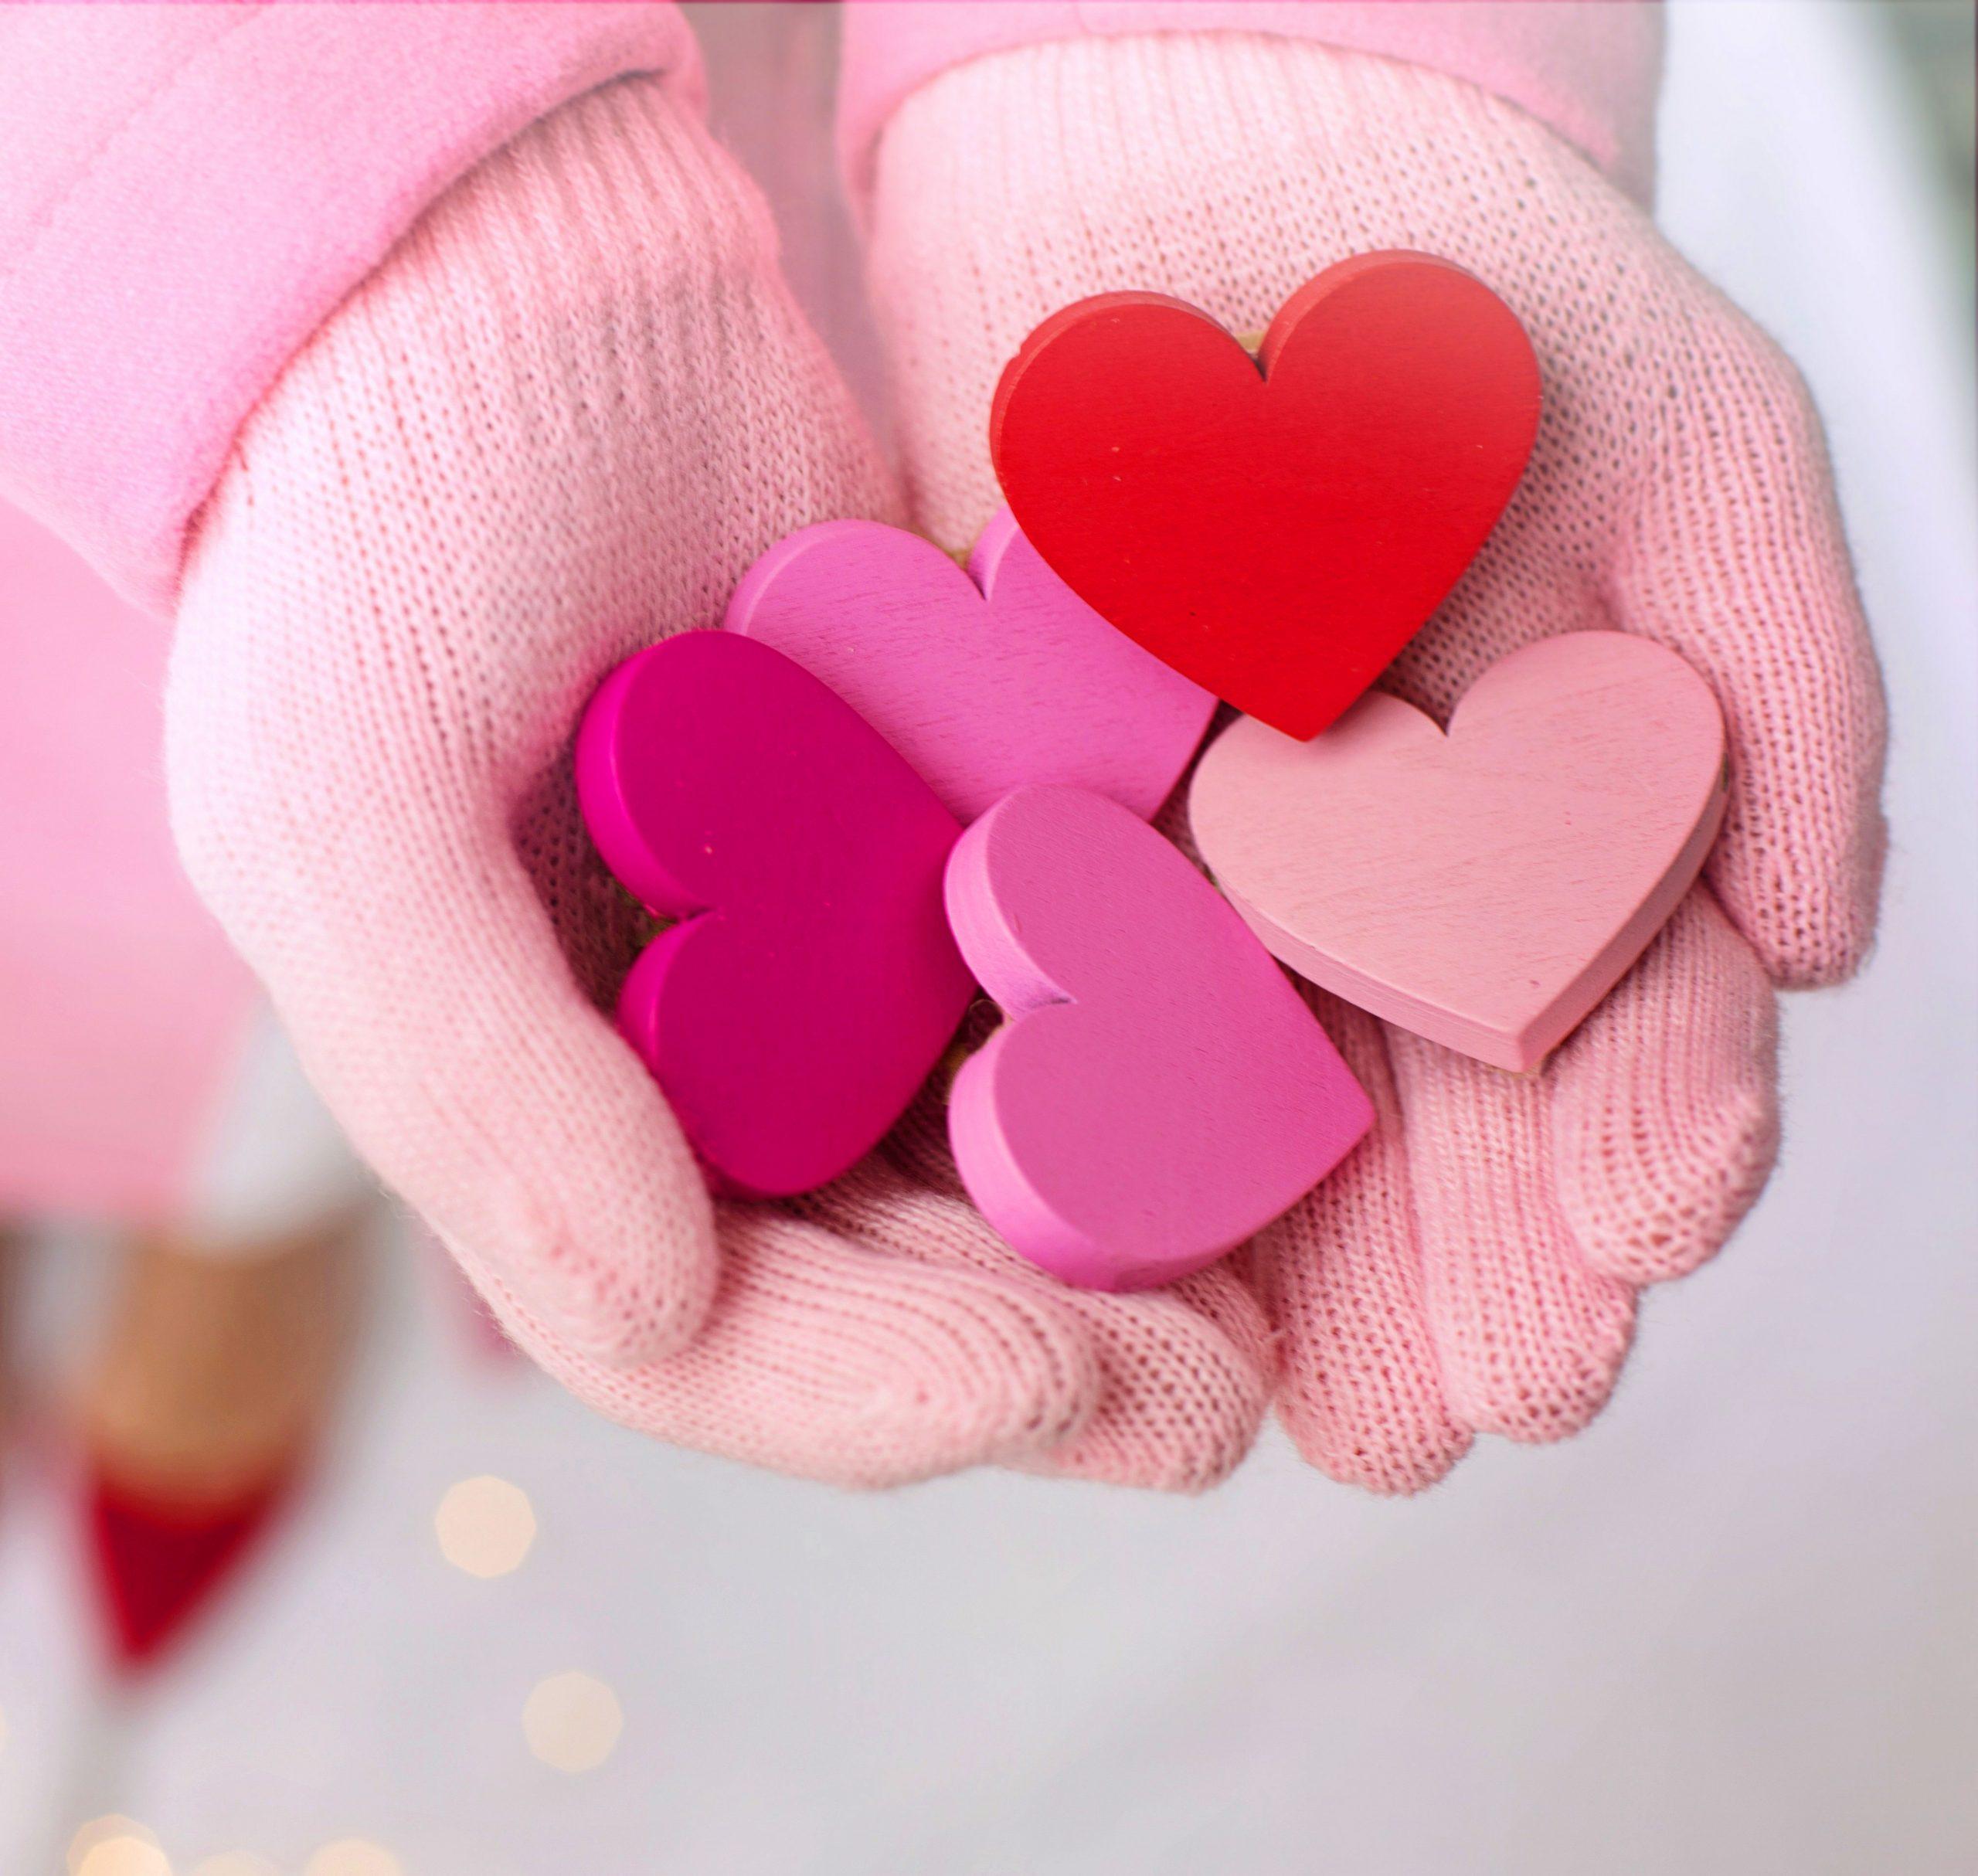 hearts Girlfriend Whatsapp Profile Images